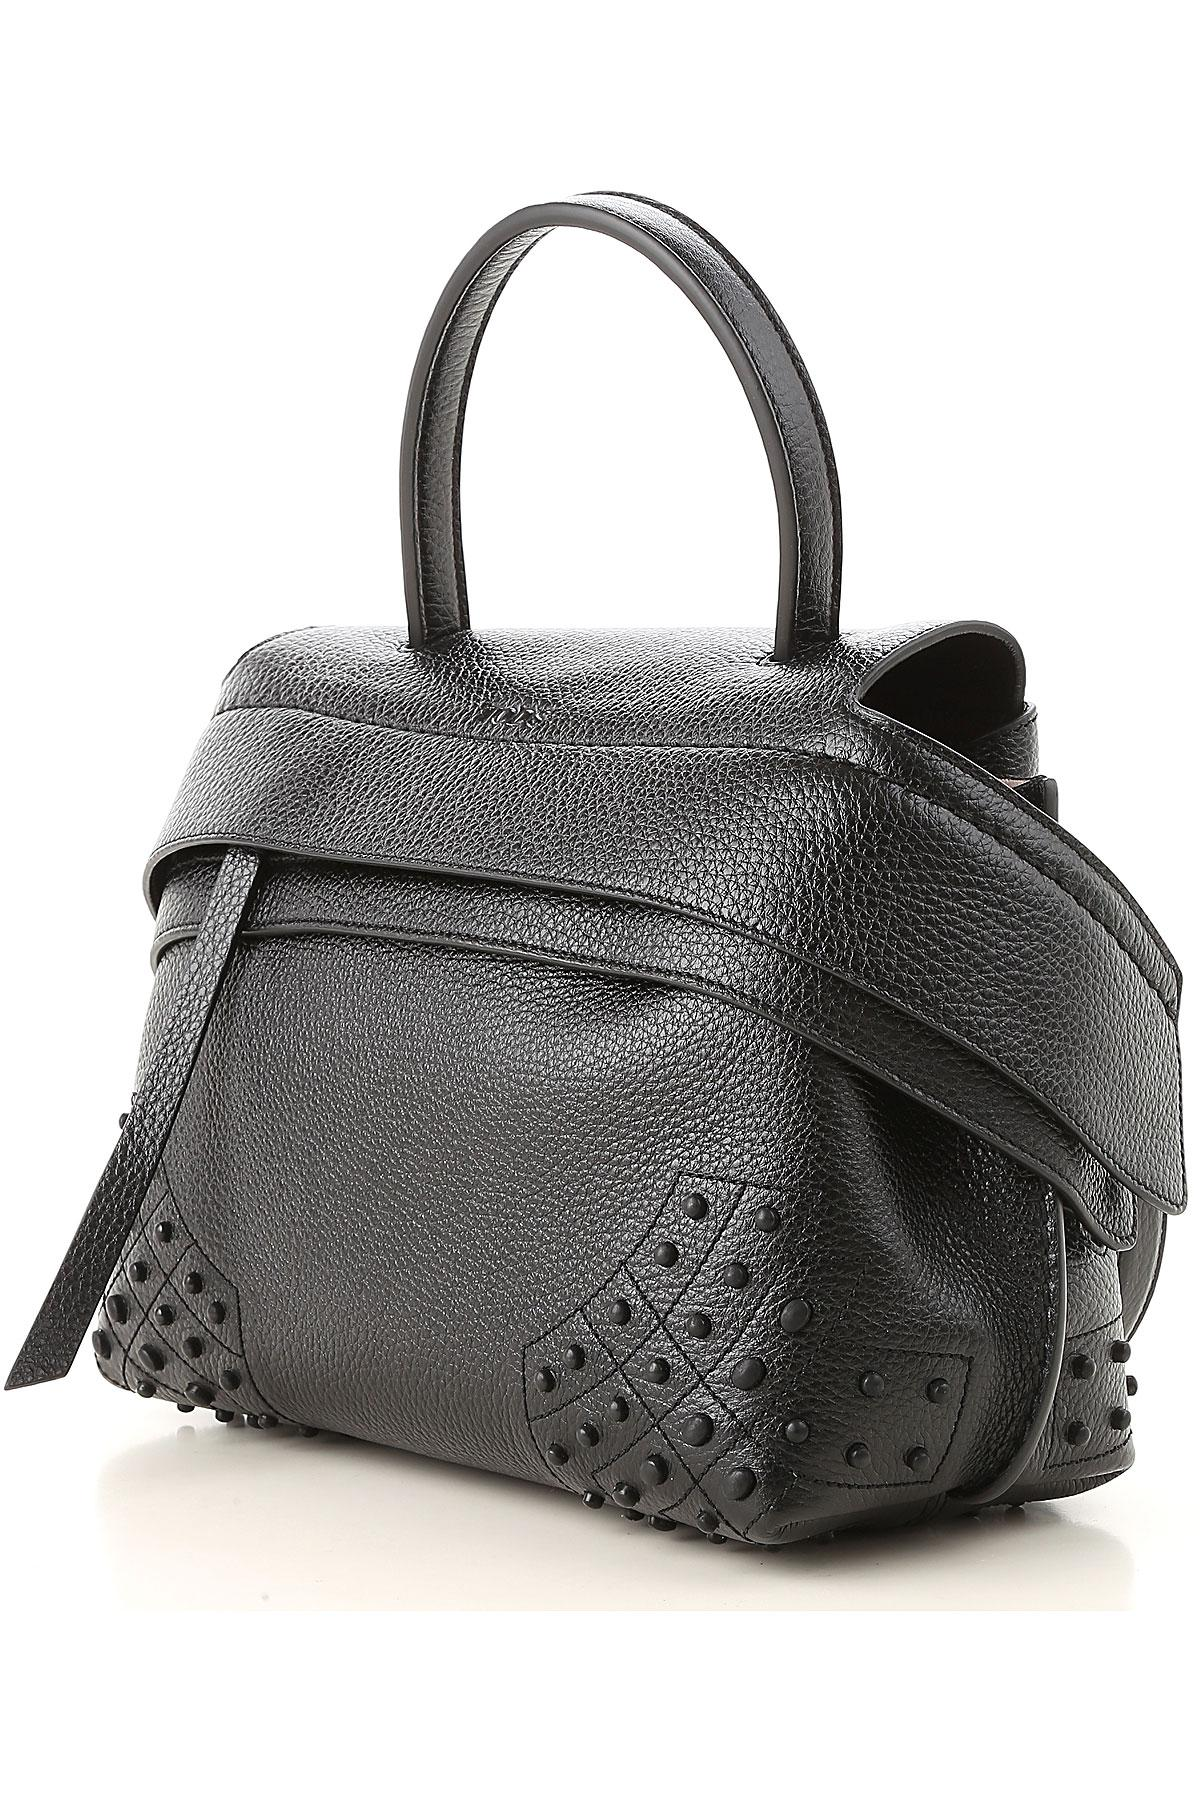 Tory Burch Shoulder Bag For Women On Sale in Black - Lyst